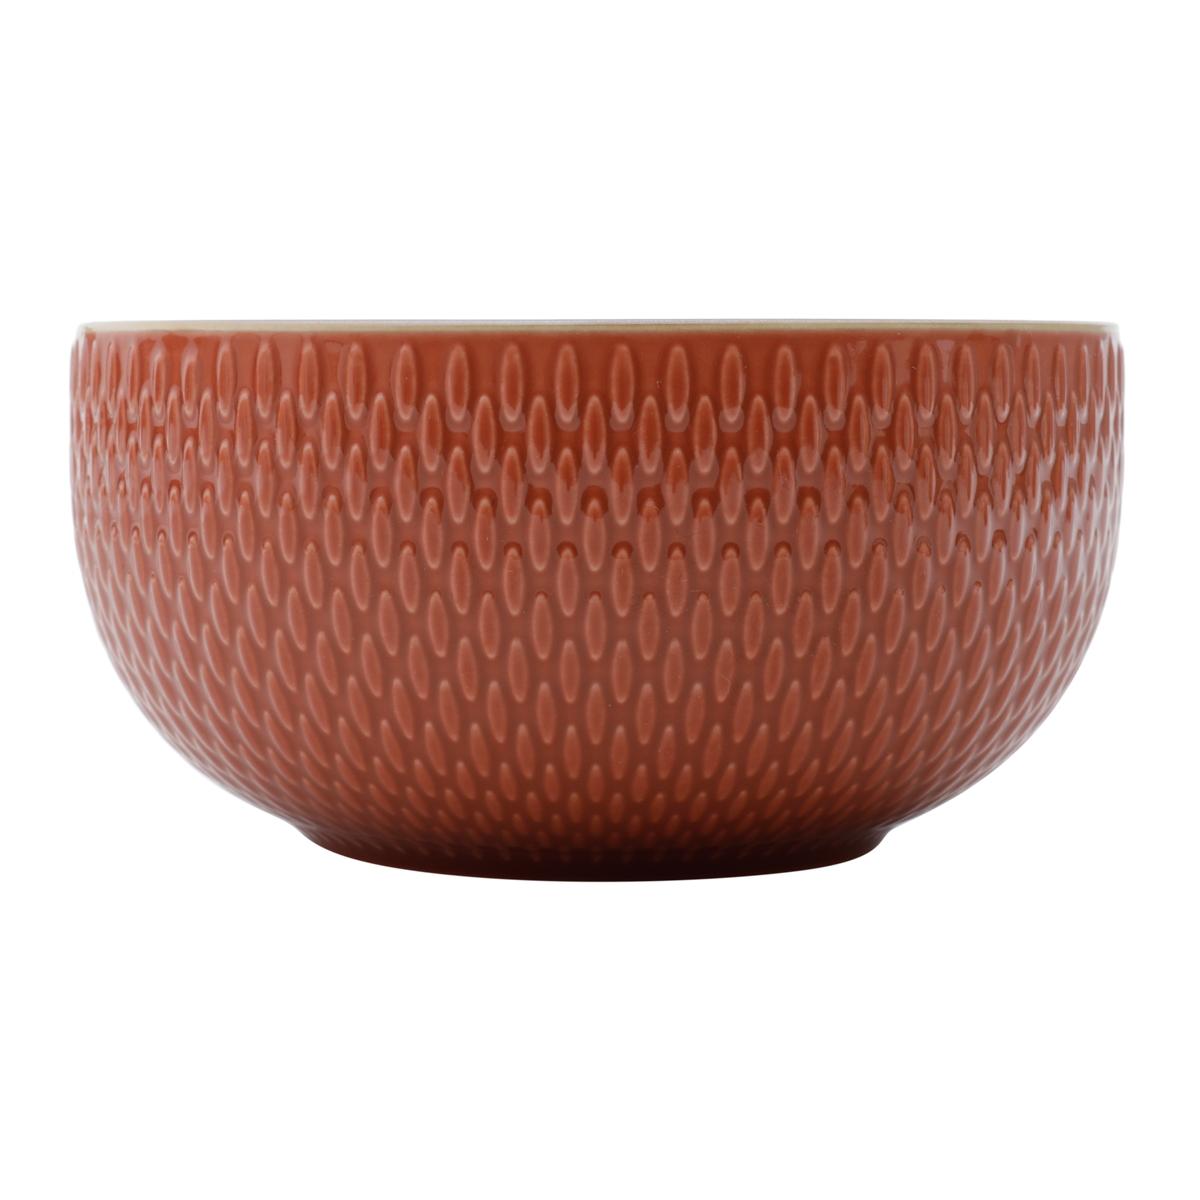 Conjunto 2 bowls em porcelana telha 700 ml 13,5x7cm Rojemac